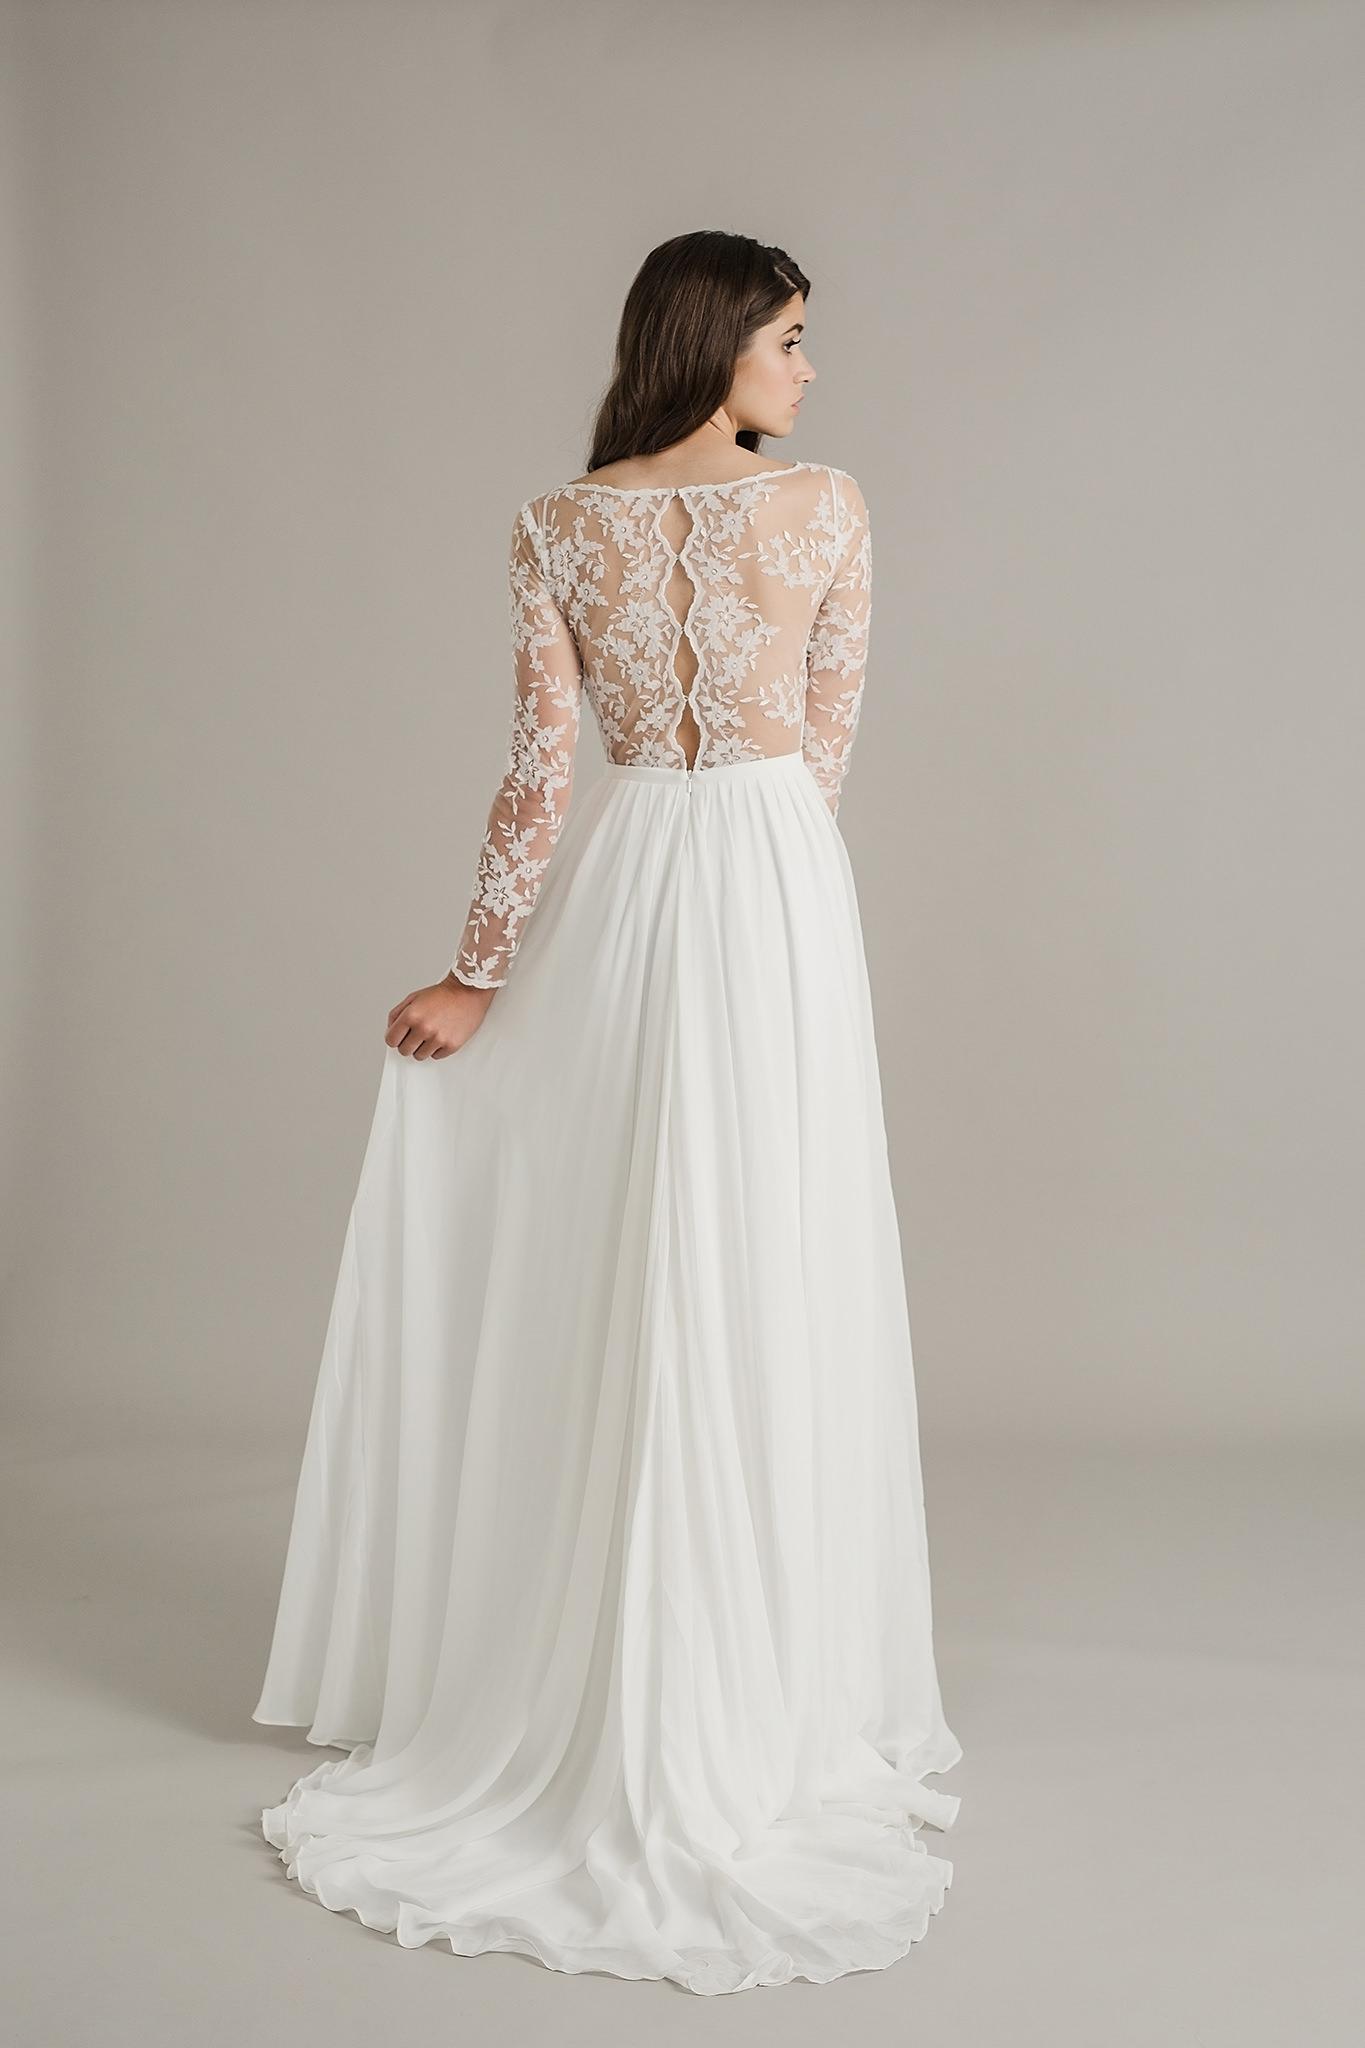 Siena wedding dress by Sally Eagle